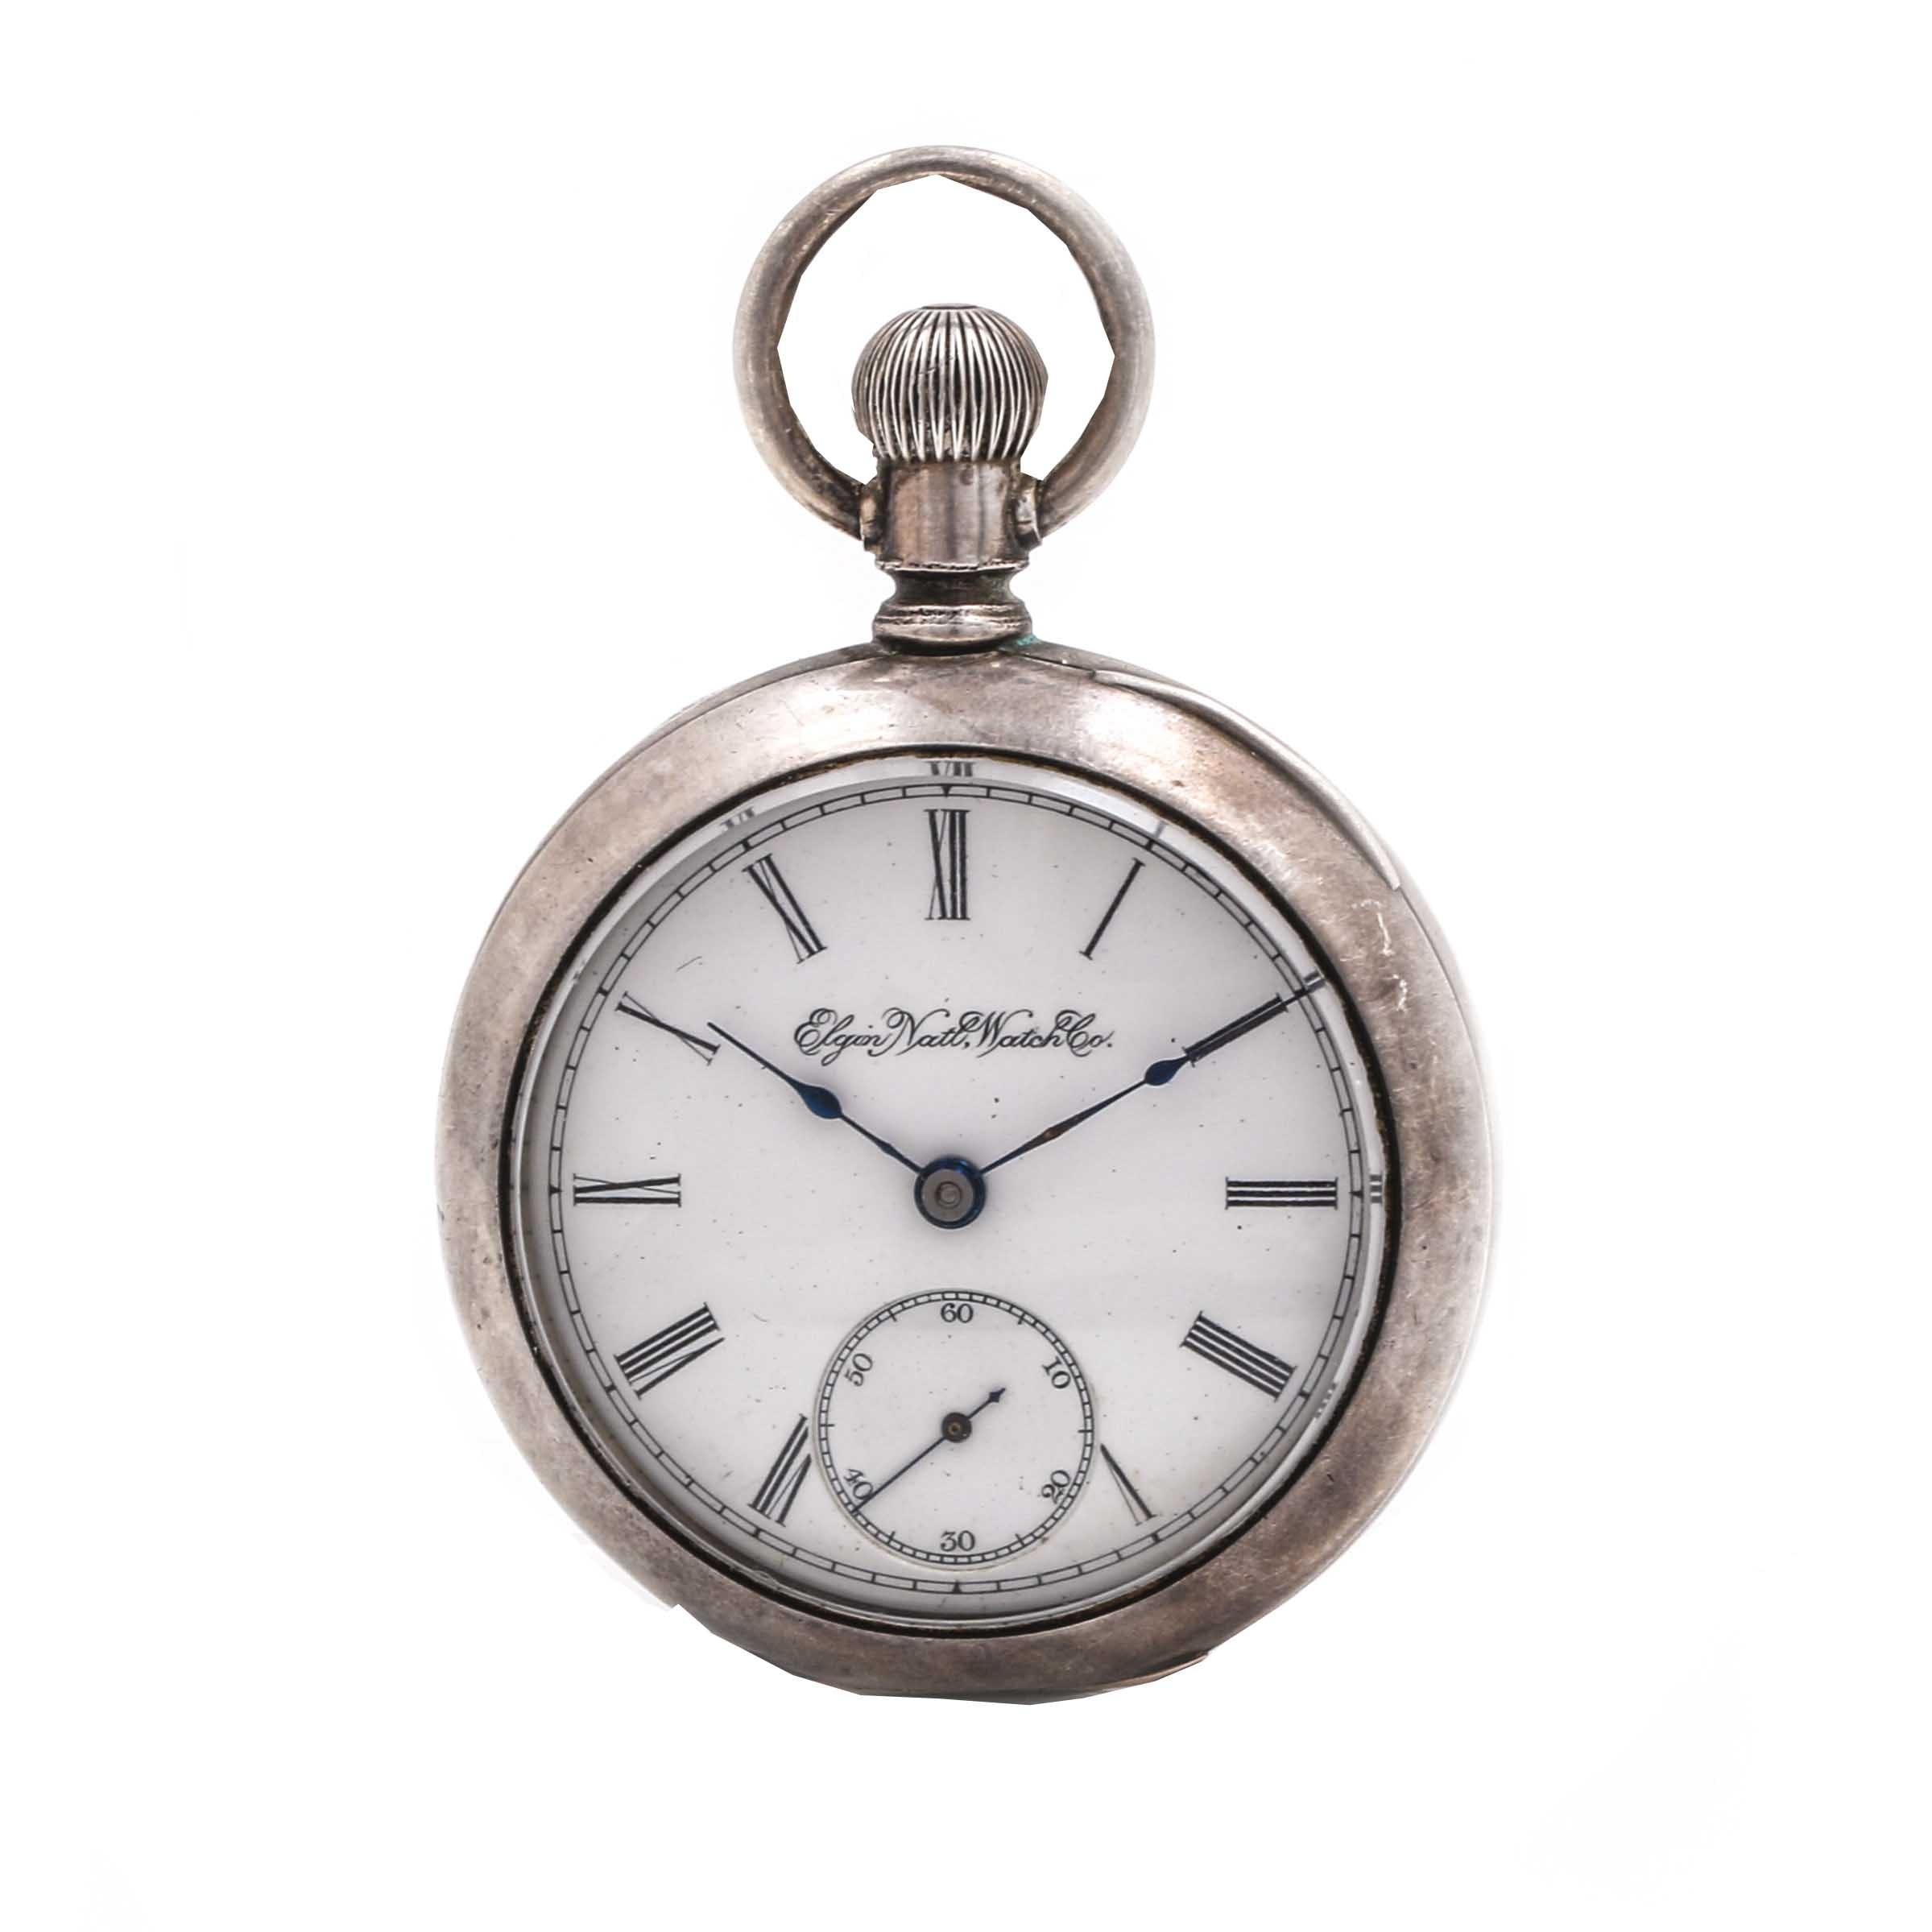 Antique Elgin National Watch Co. Pocket Watch